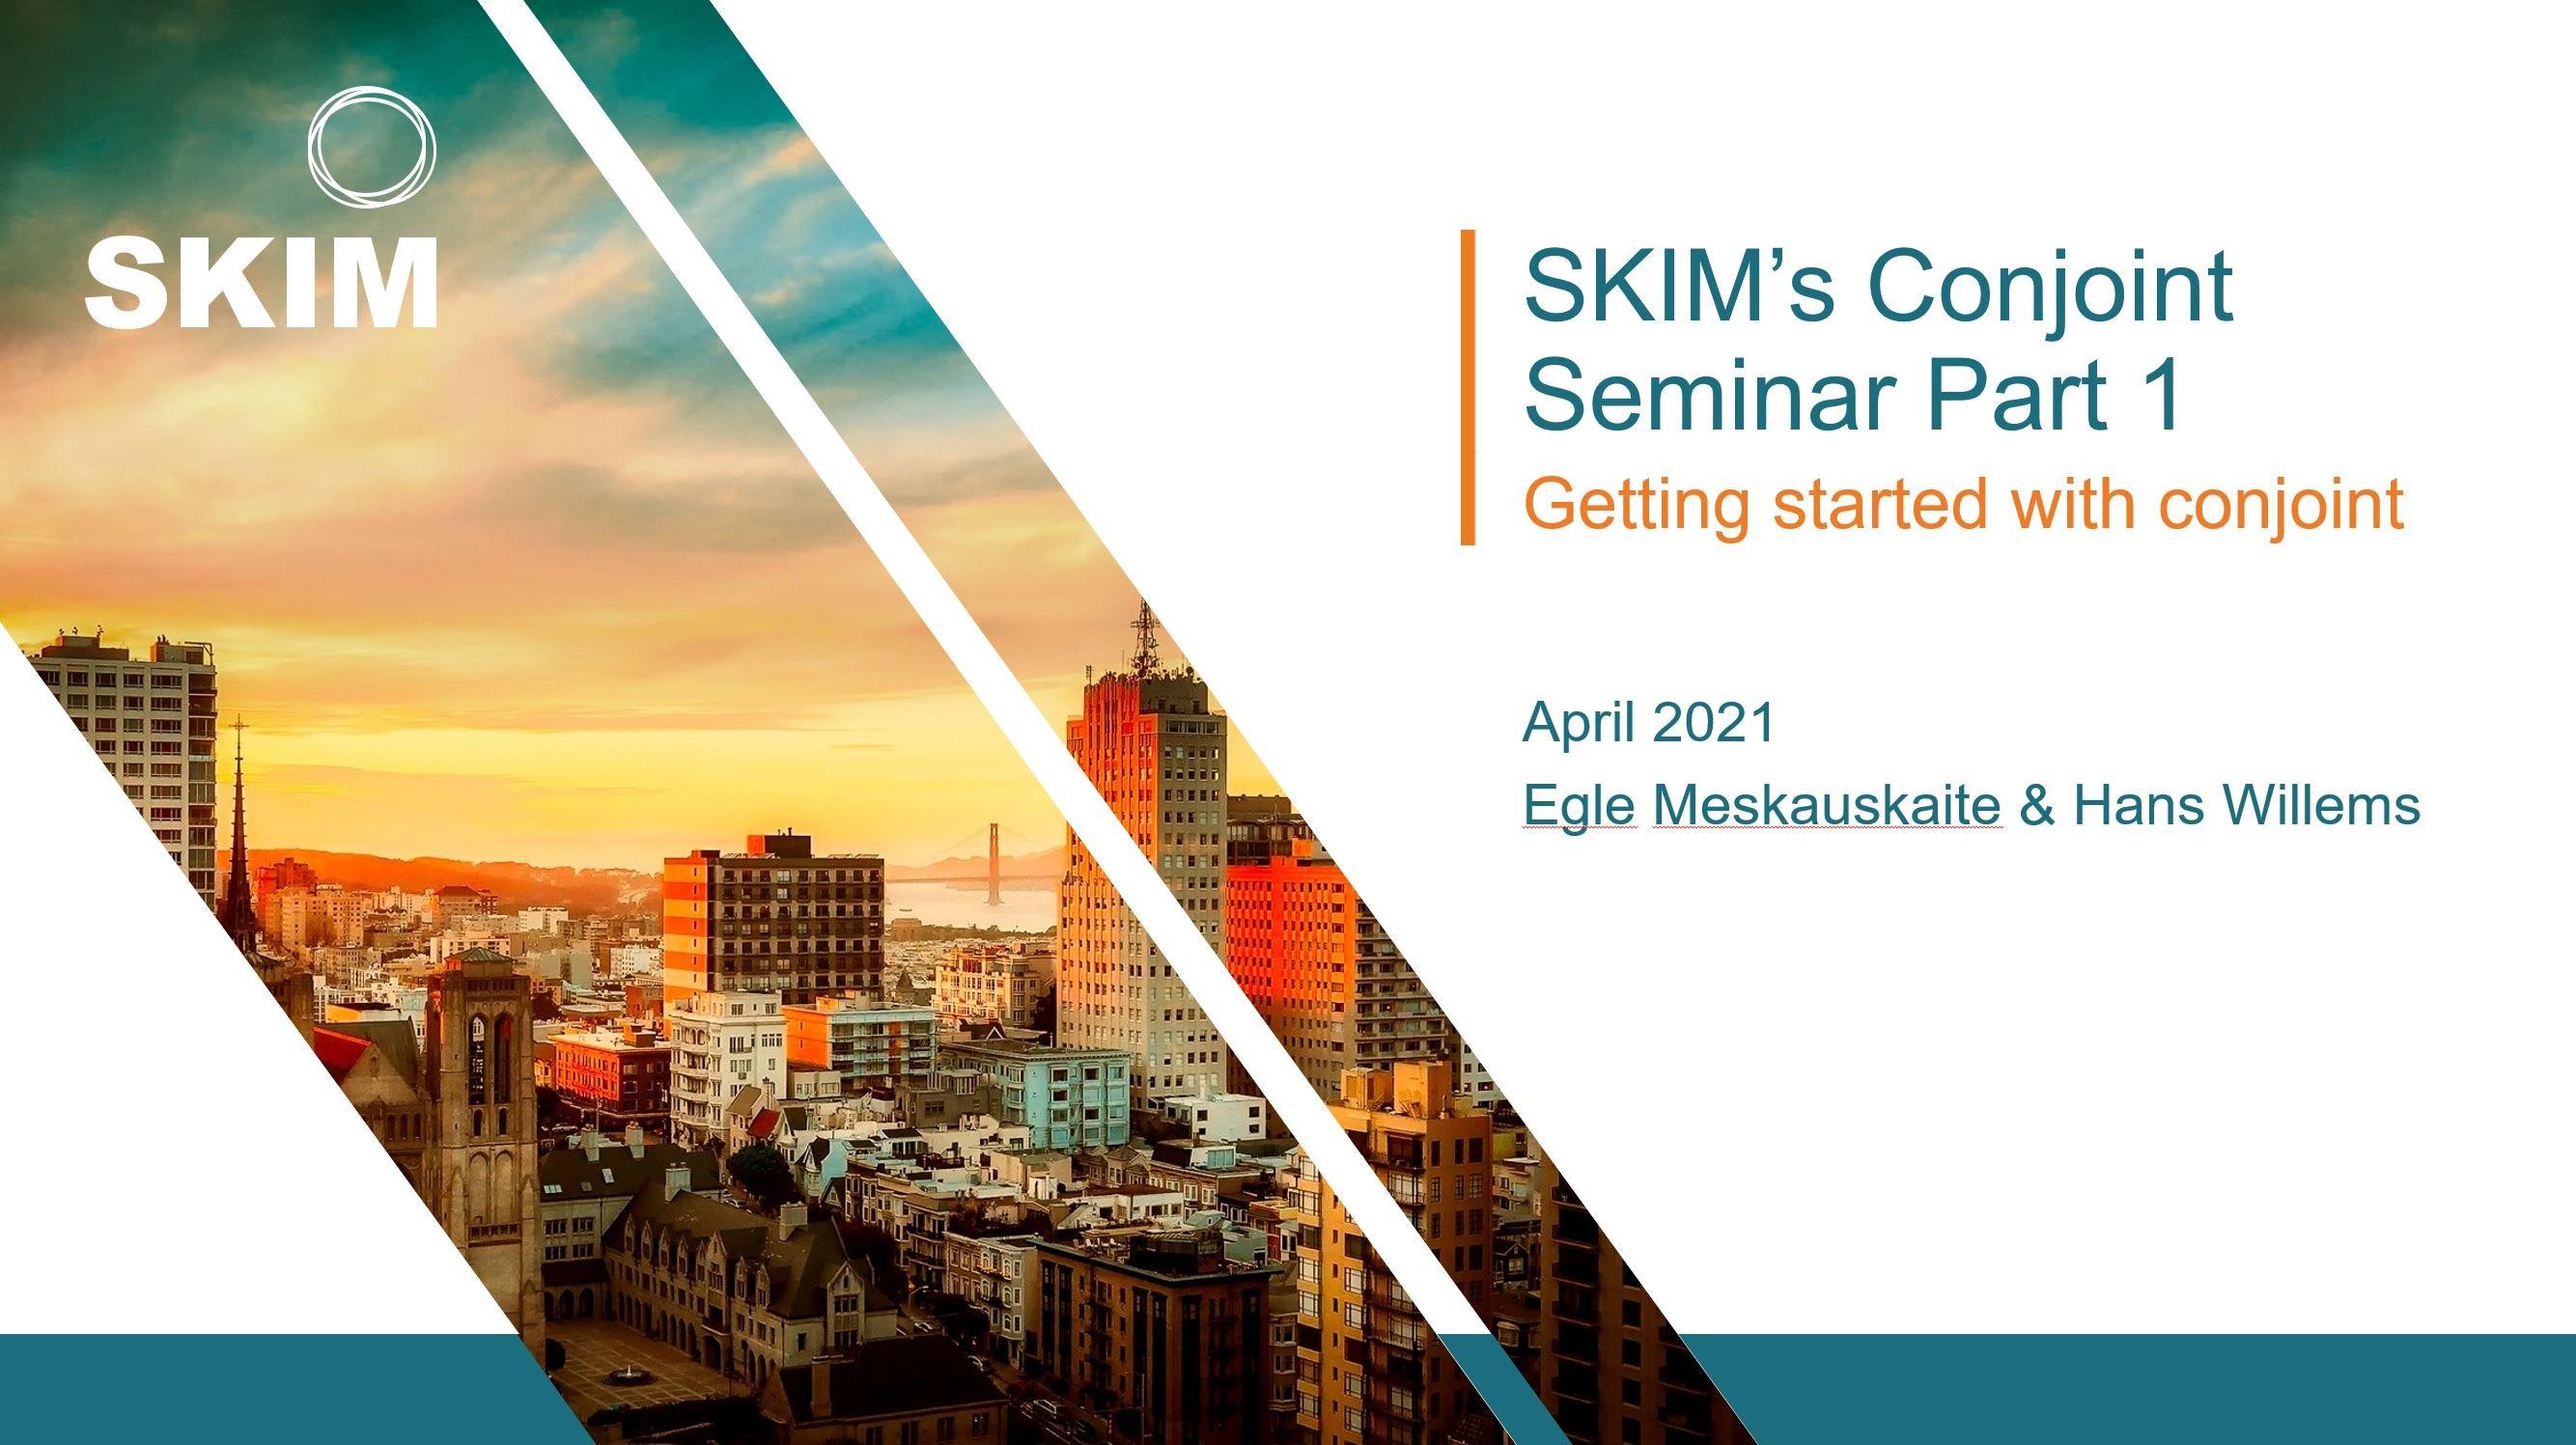 SKIM Conjoint Seminar 2021